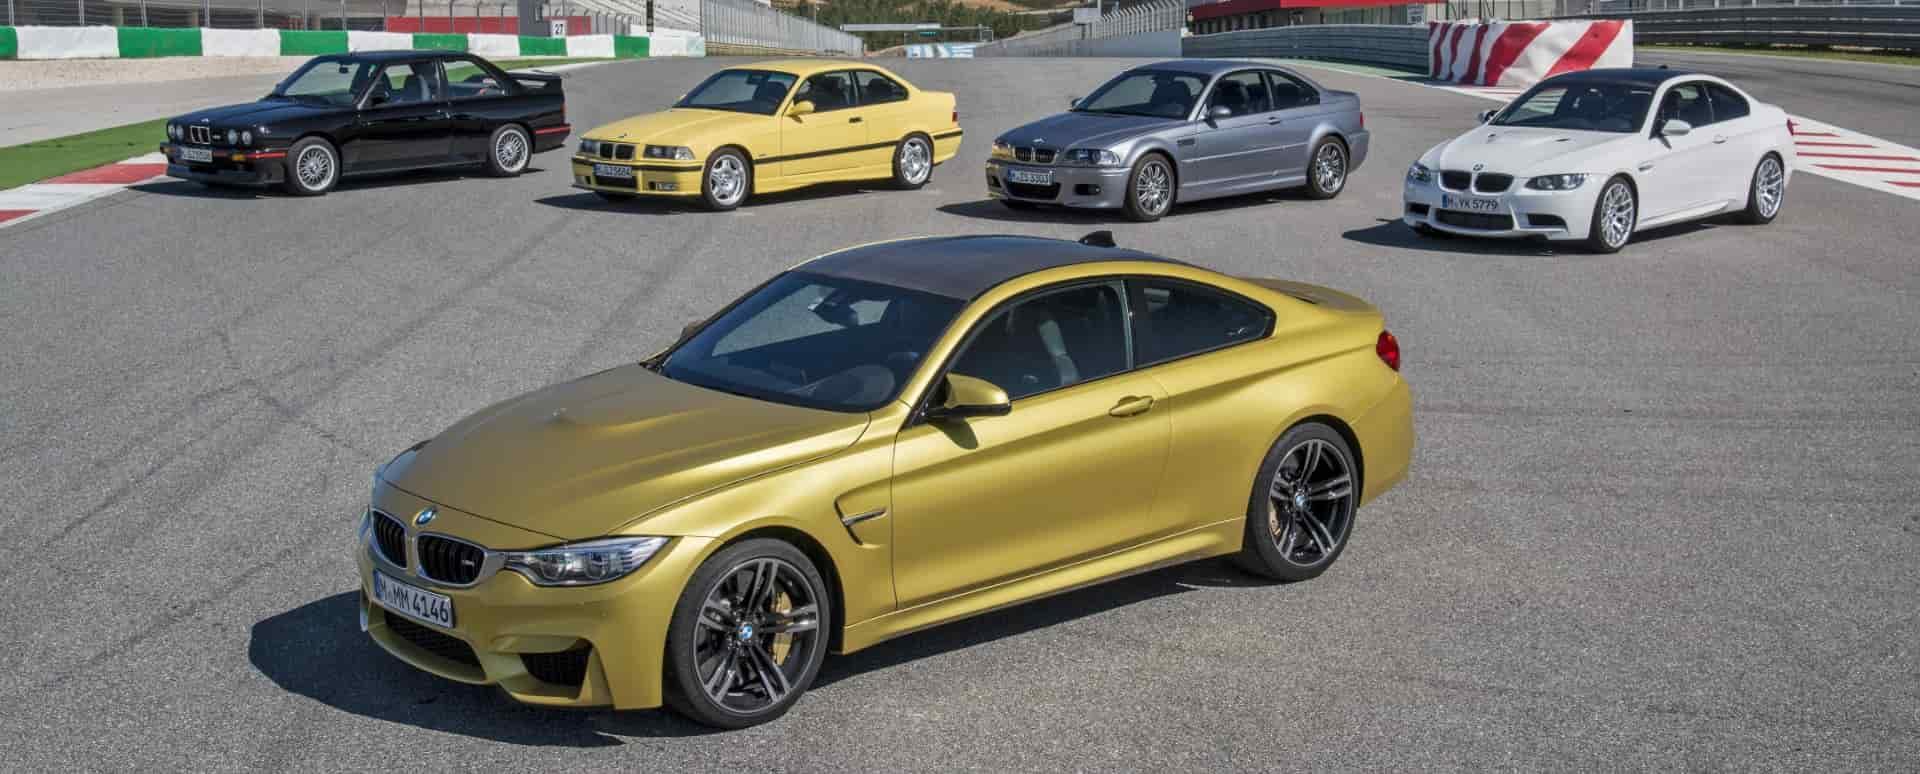 BMW M Cars: On Track